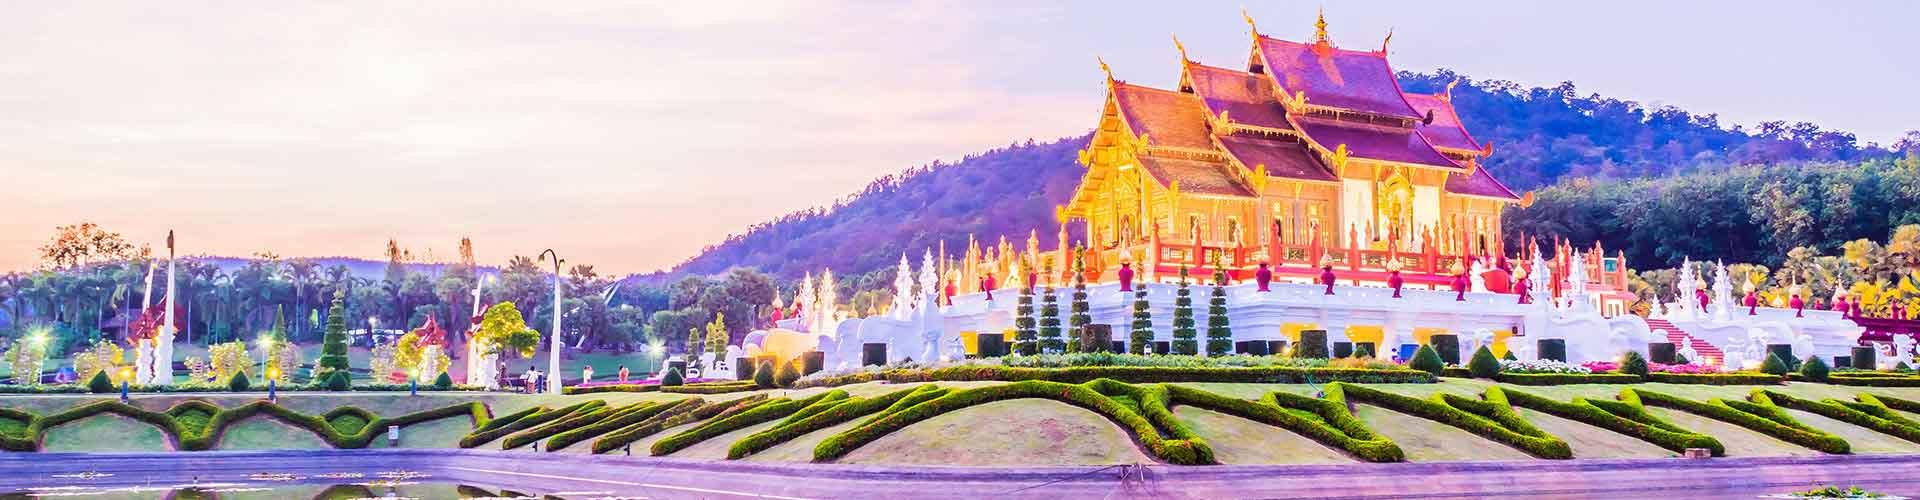 Chiang Mai - Apartamentos en Chiang Mai. Mapas de Chiang Mai, Fotos y comentarios de cada Apartamento en Chiang Mai.